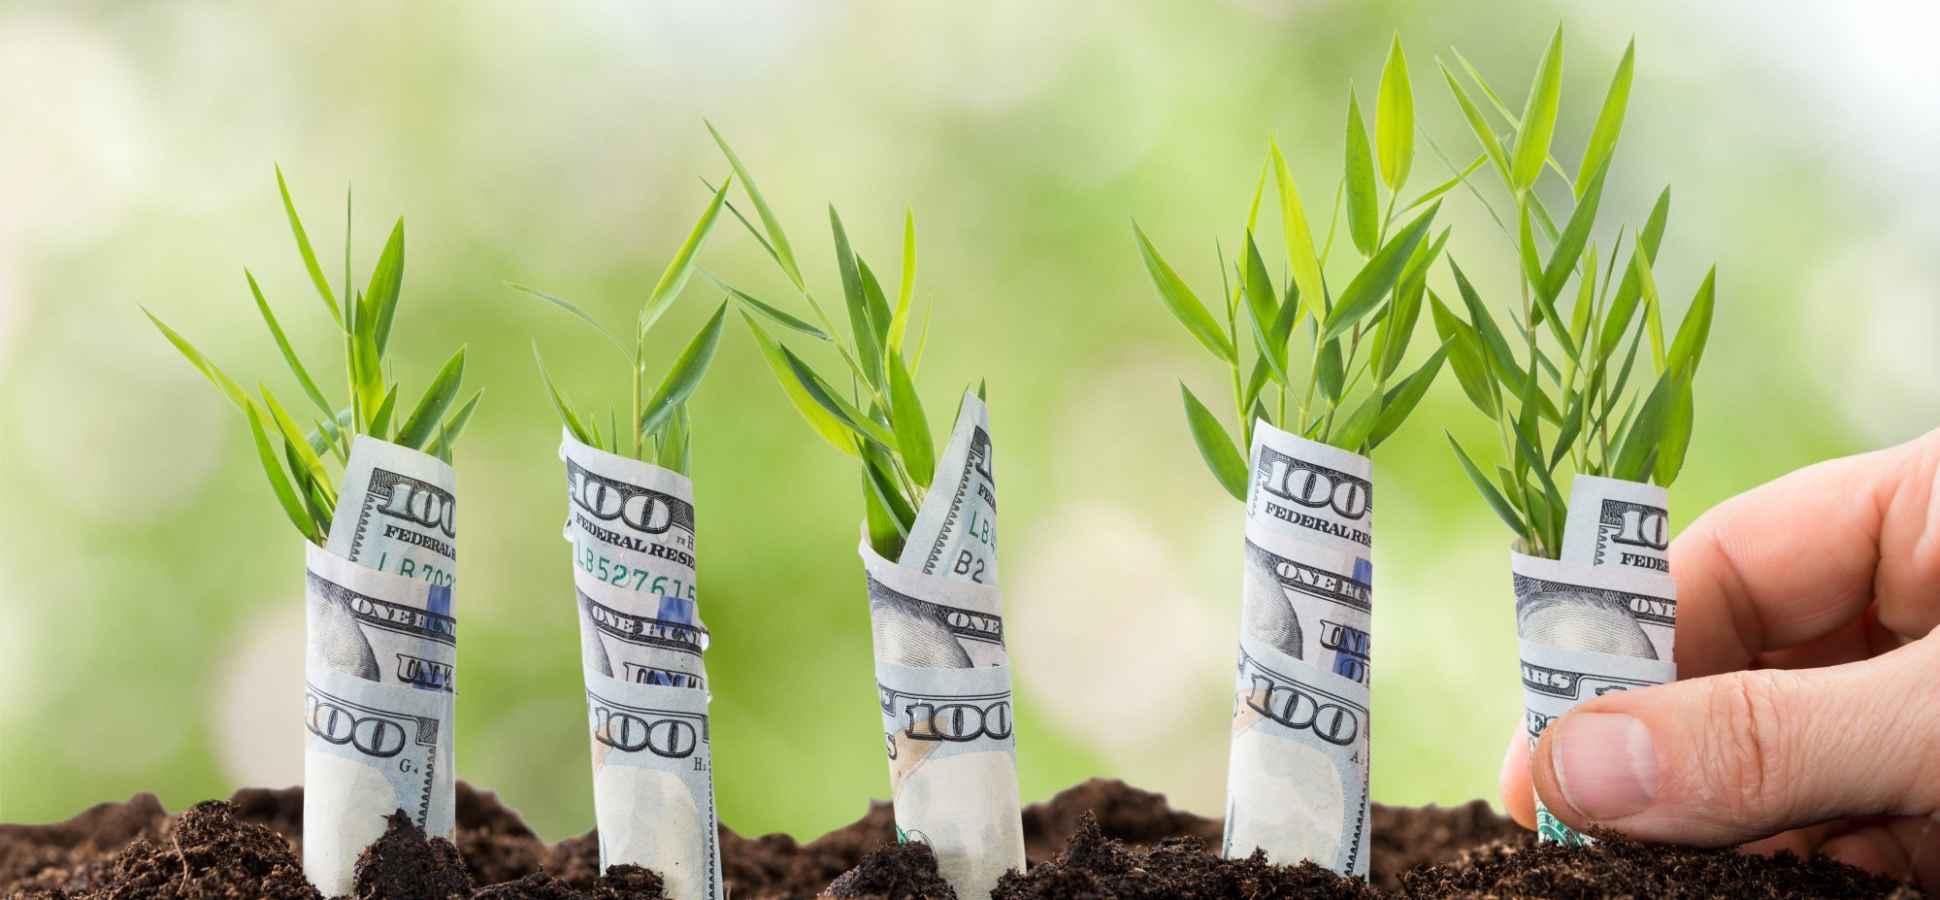 Entrepreneurs, Don't Make This Mistake When Raising Capital